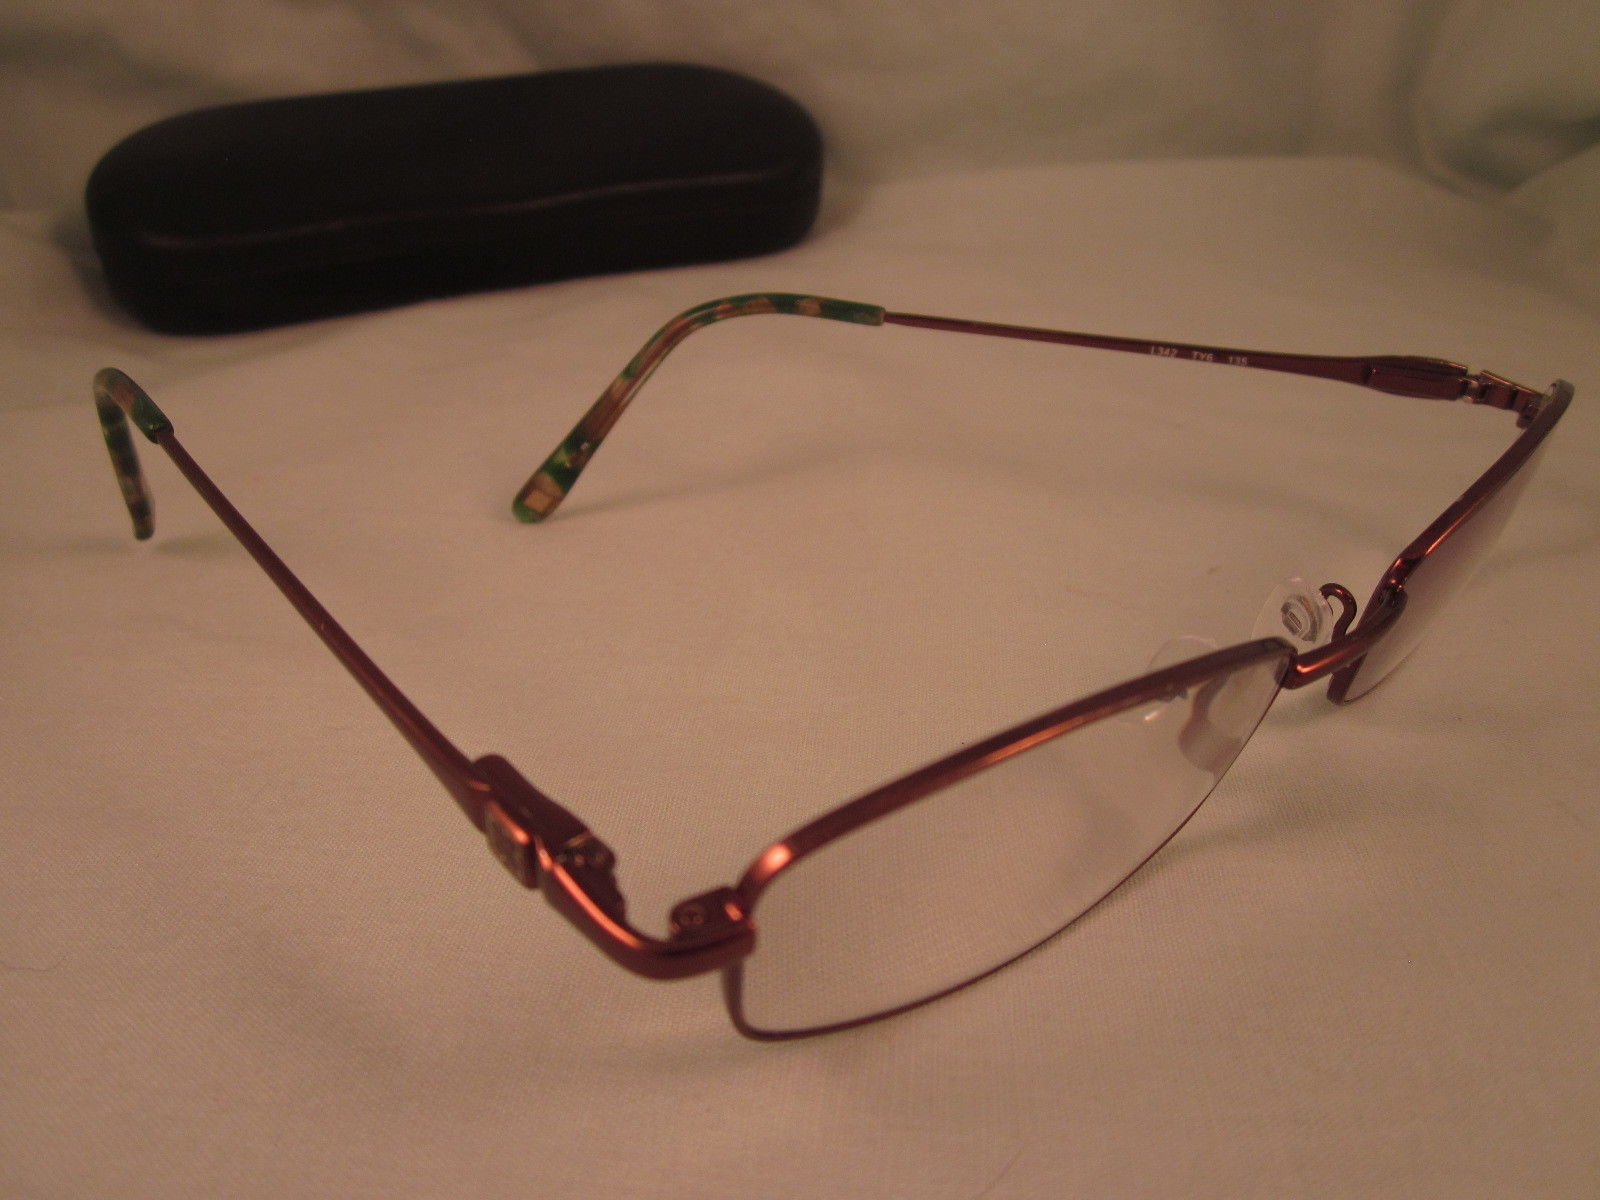 Liz Claiborne Eyeglasses: 25 listings